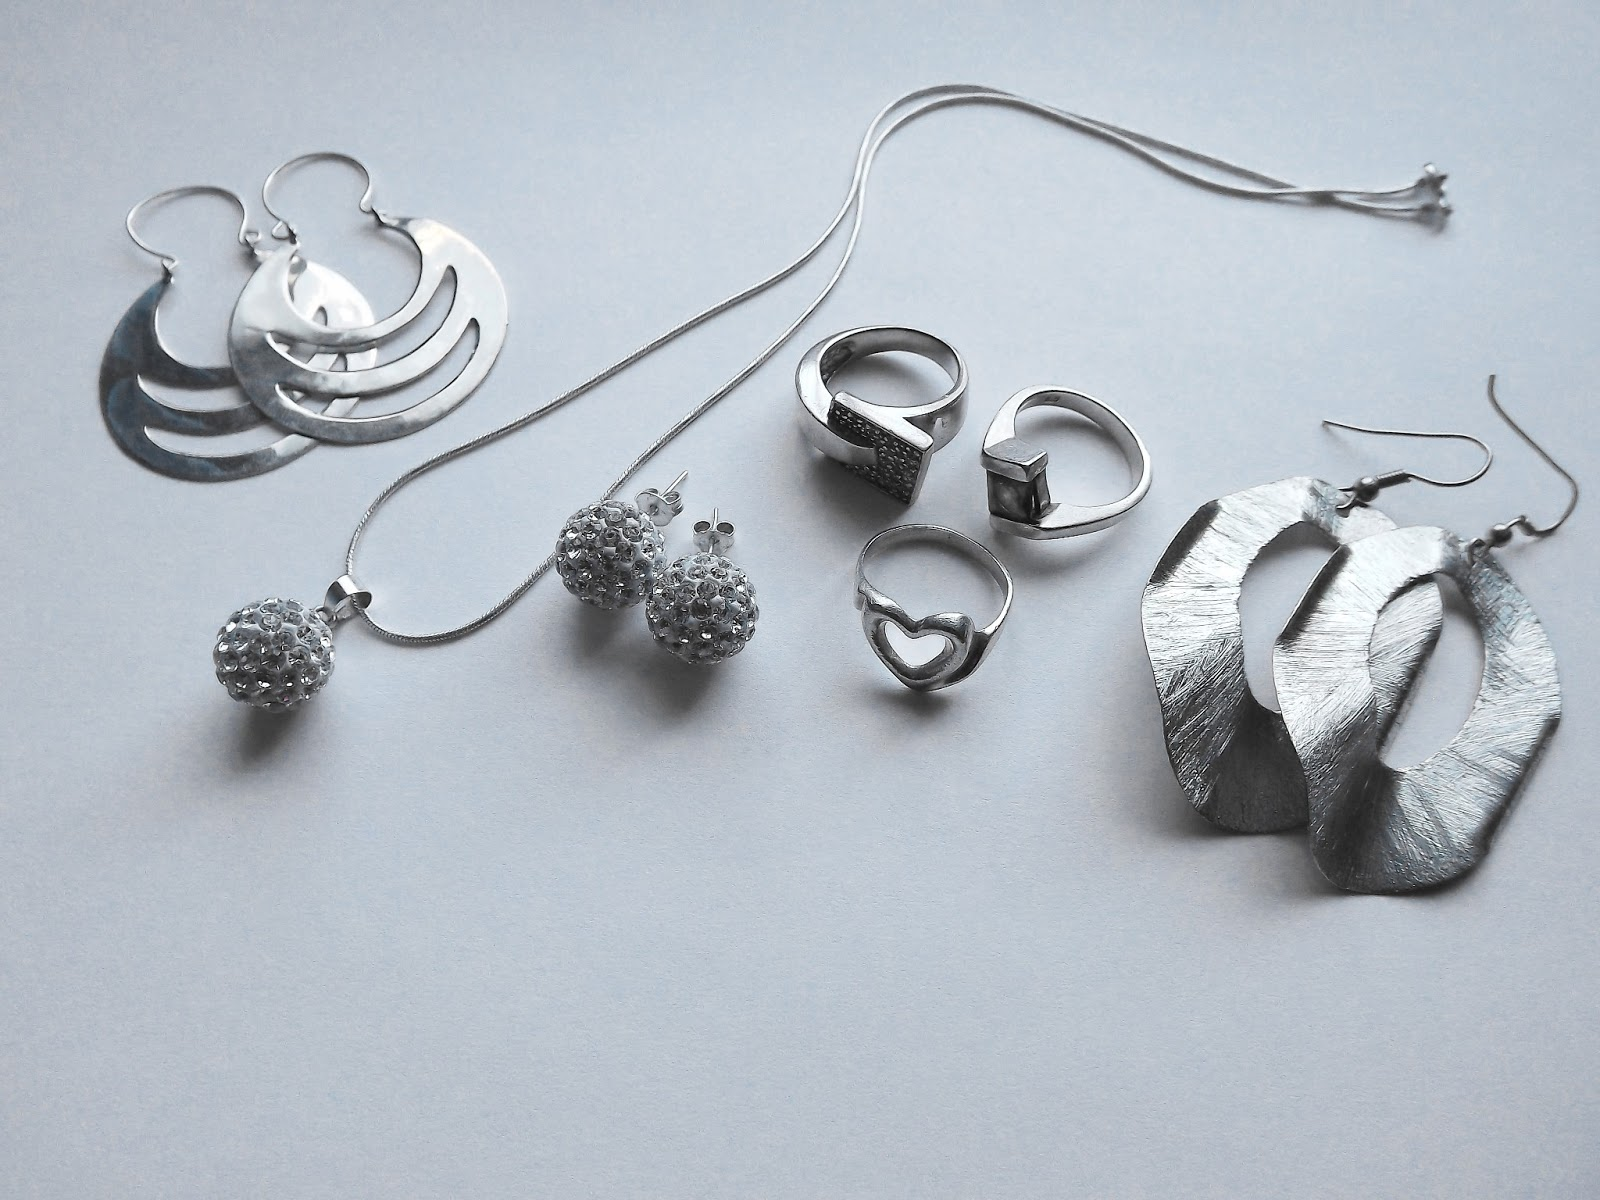 8b318b181585 Cómo saber si son joyas de plata - Rojo Anaranjado - By  Daniela ...